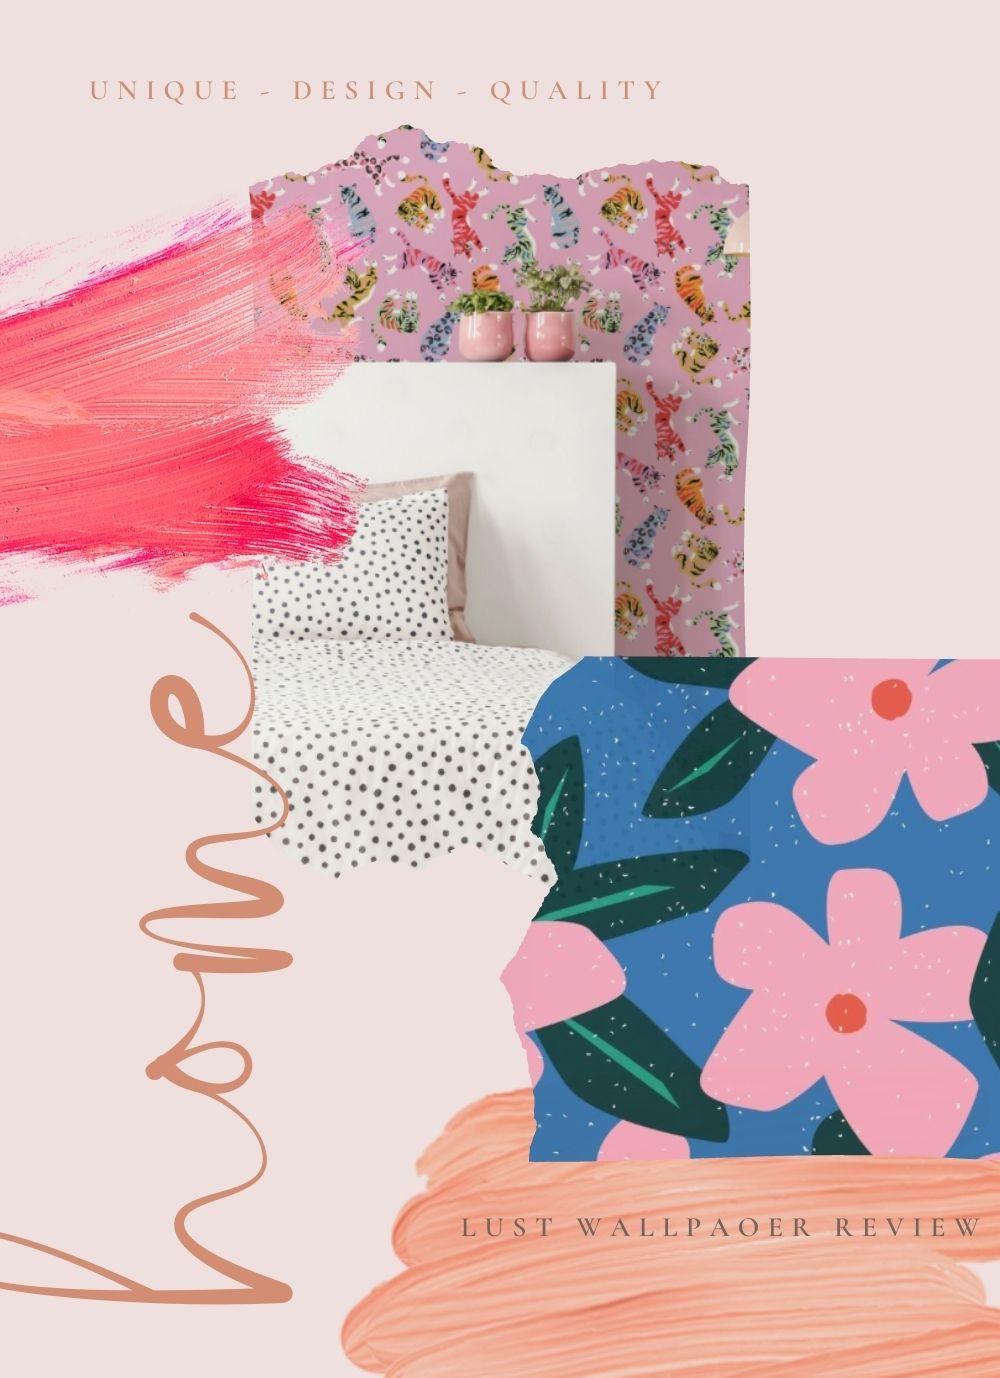 Lust wallpaper review